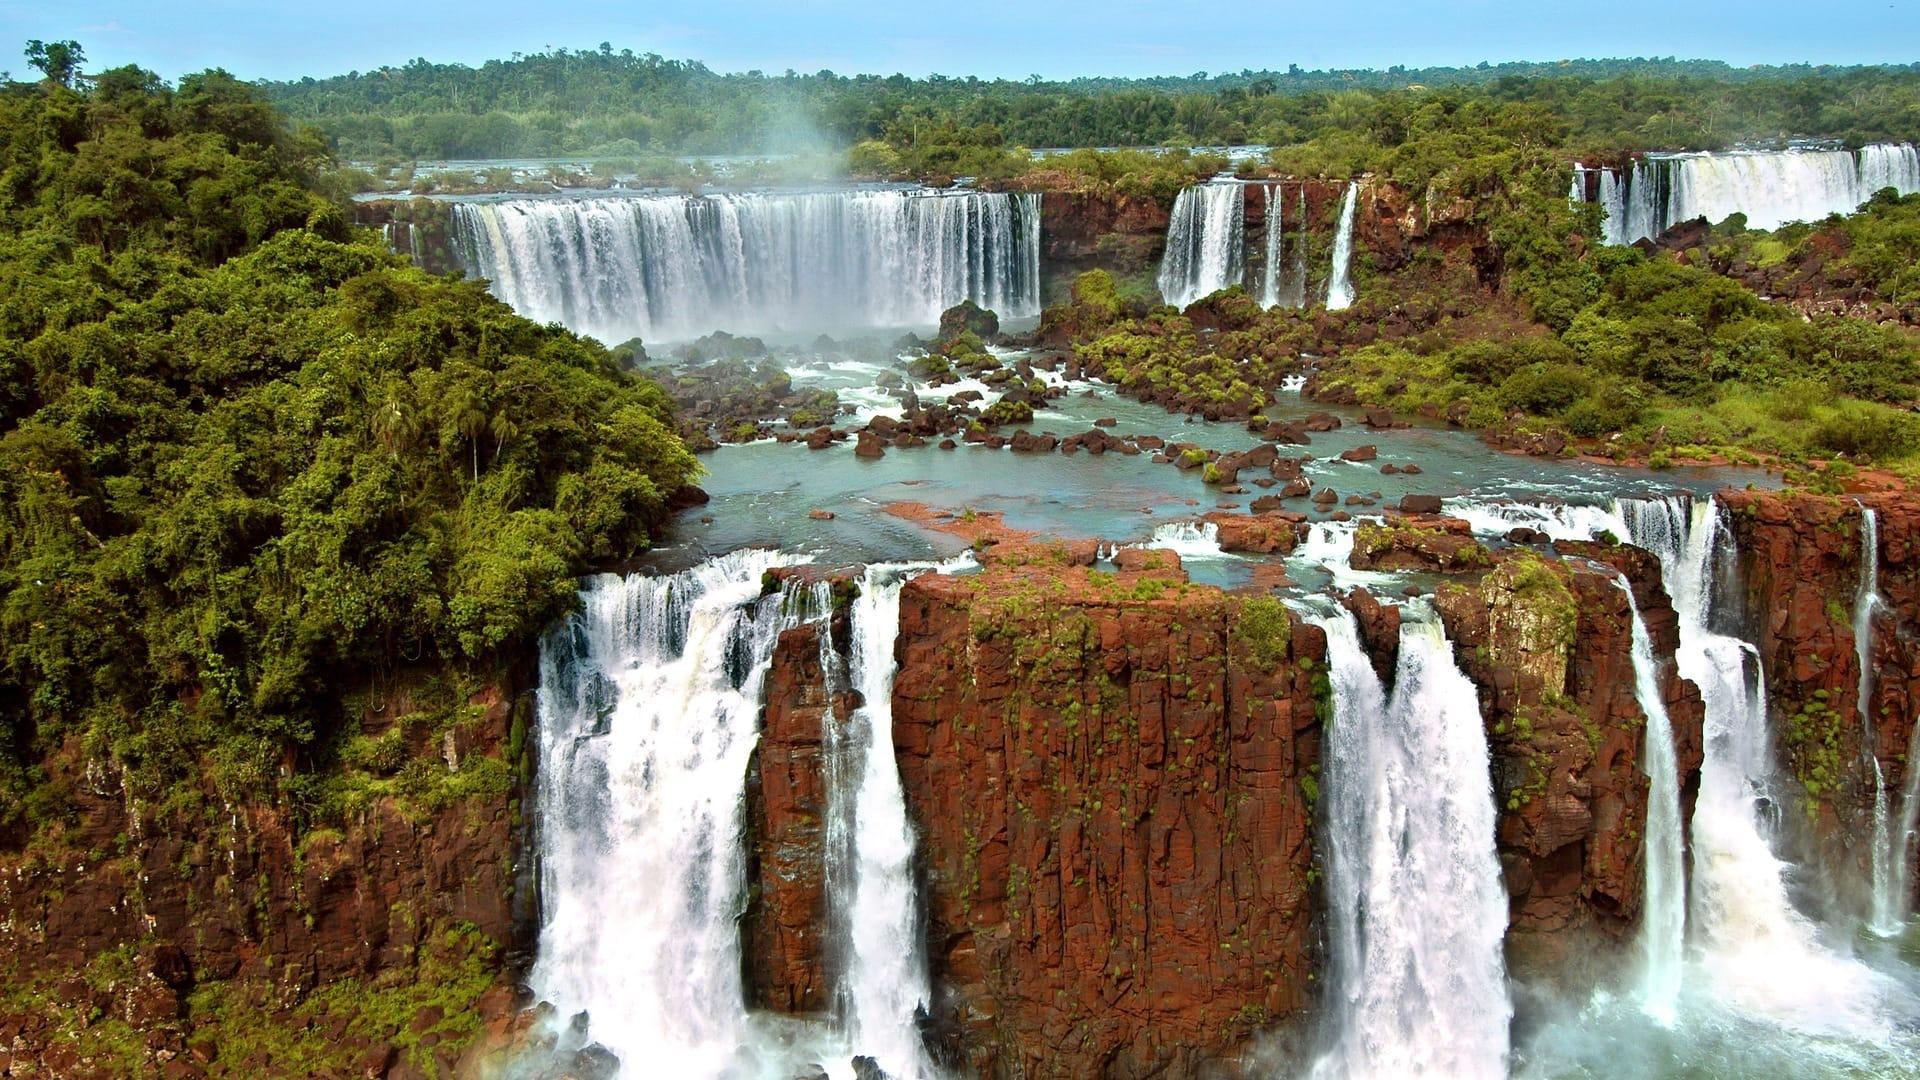 Iguazu waterfalls (Argentina and Brazil)